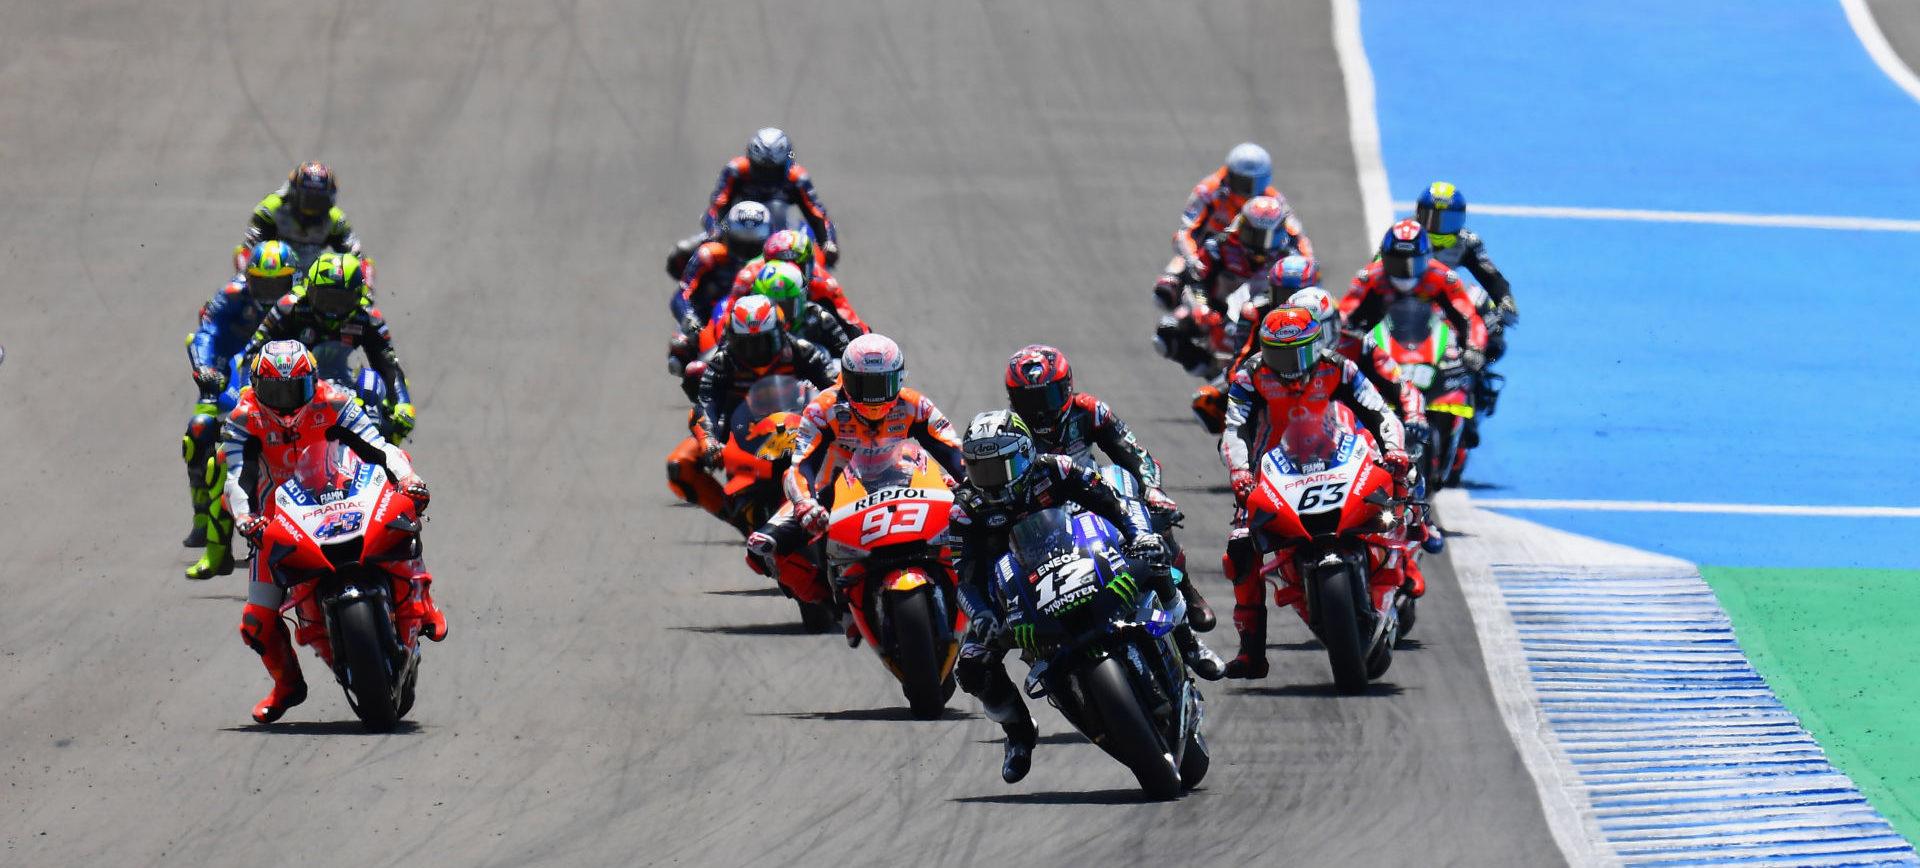 The start of the Spanish Grand Prix at Jerez. Photo courtesy Michelin.